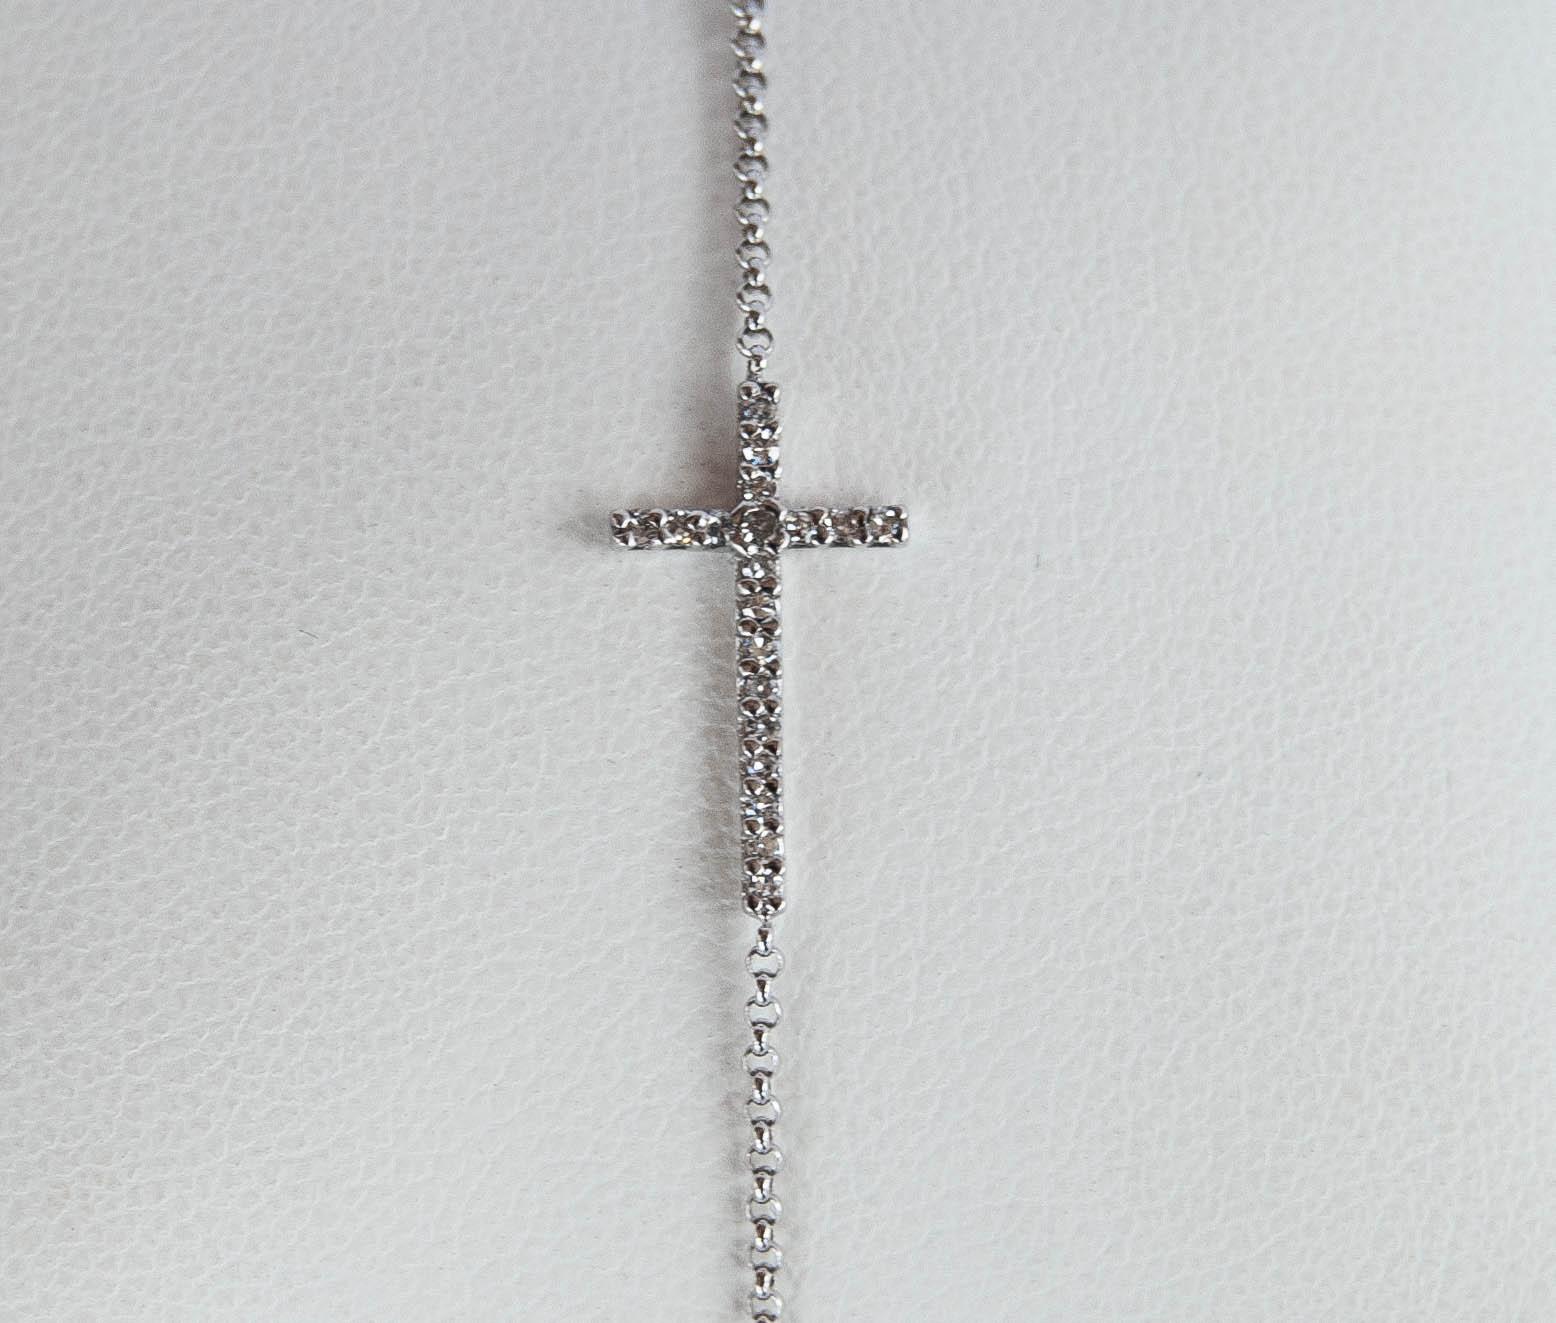 170-35 14 karat white gold Cross Bracelet Length 7 With 0.10Tw Round Diamonds $588.00